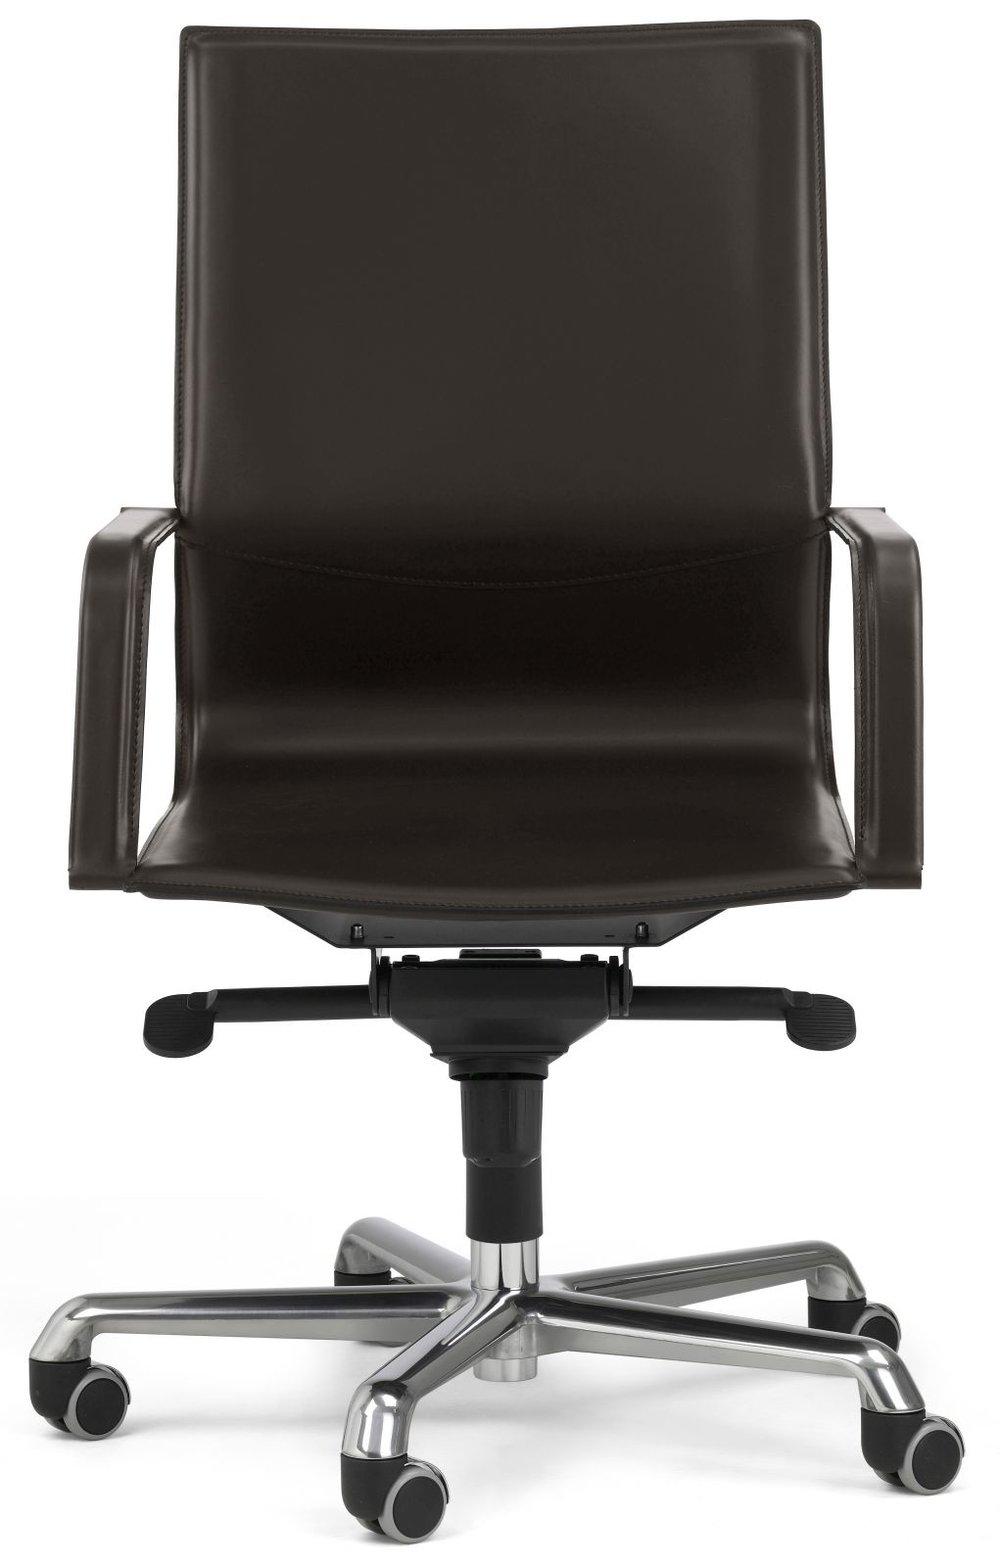 modern-office-chairs-Italian-furniture-designer-chairs (45).jpg